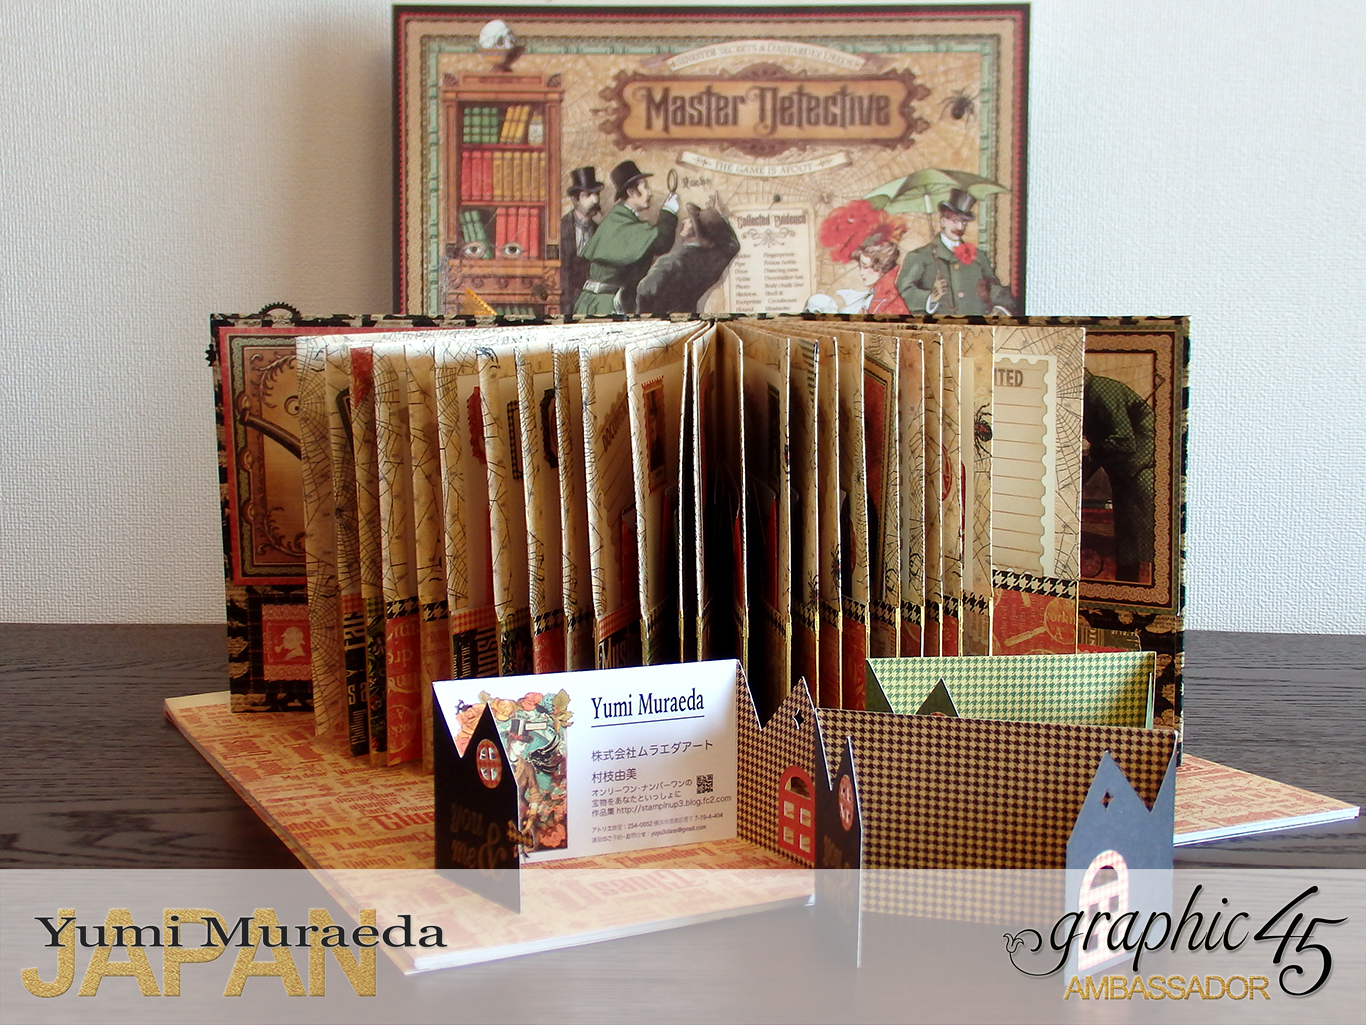 4MasterdetectivenamecardbookdesignbyyumimuraedaproductbyGraphic45.jpg